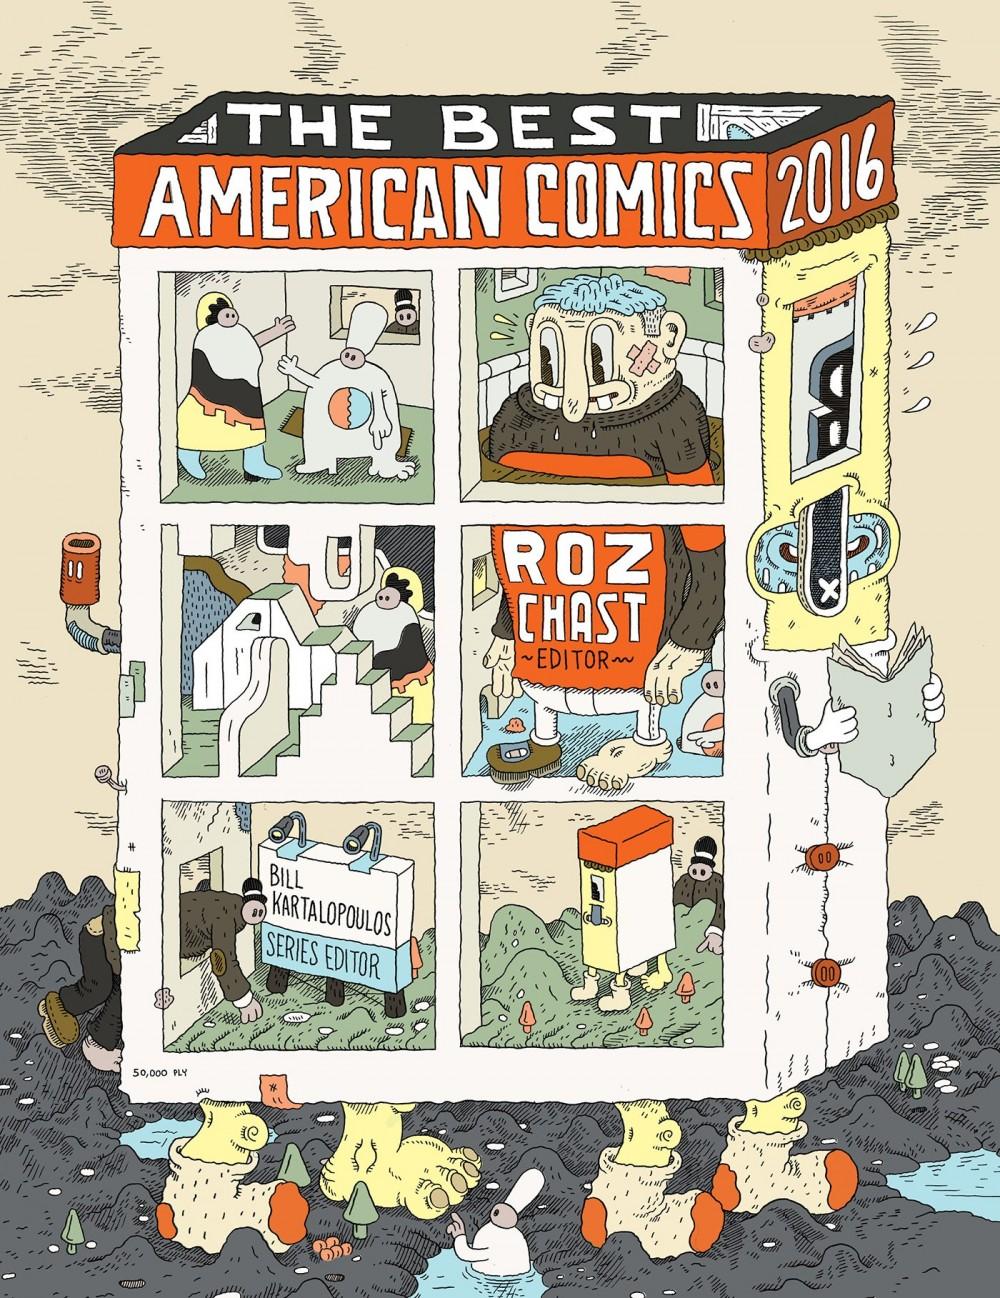 The Best American Comics 2016: a capa da coletânea editada por Roz Chast